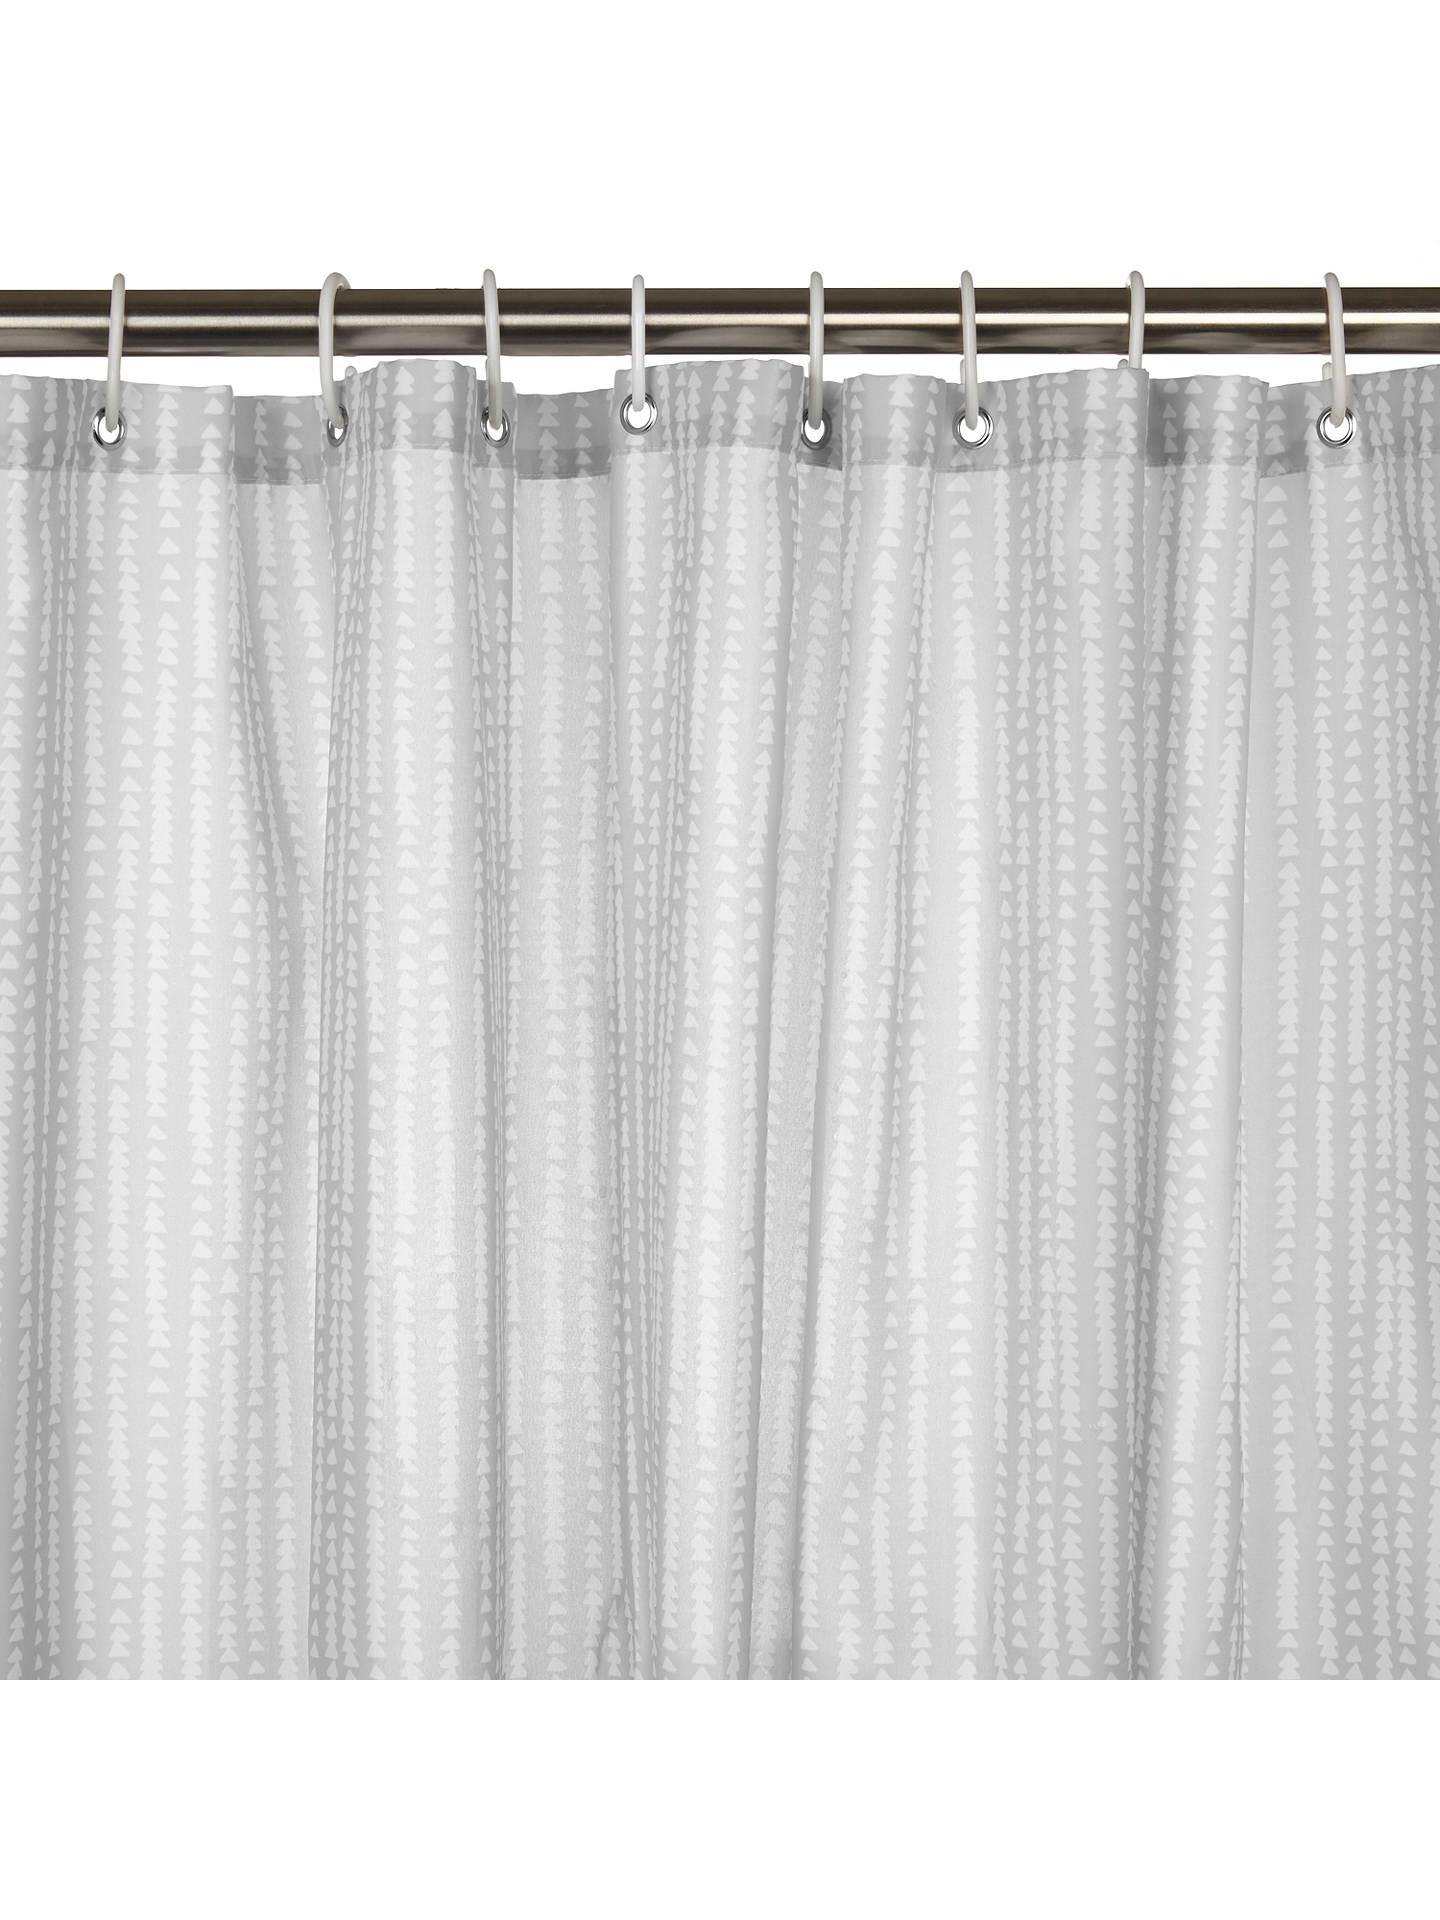 john lewis xander shower curtain at john lewis partners. Black Bedroom Furniture Sets. Home Design Ideas